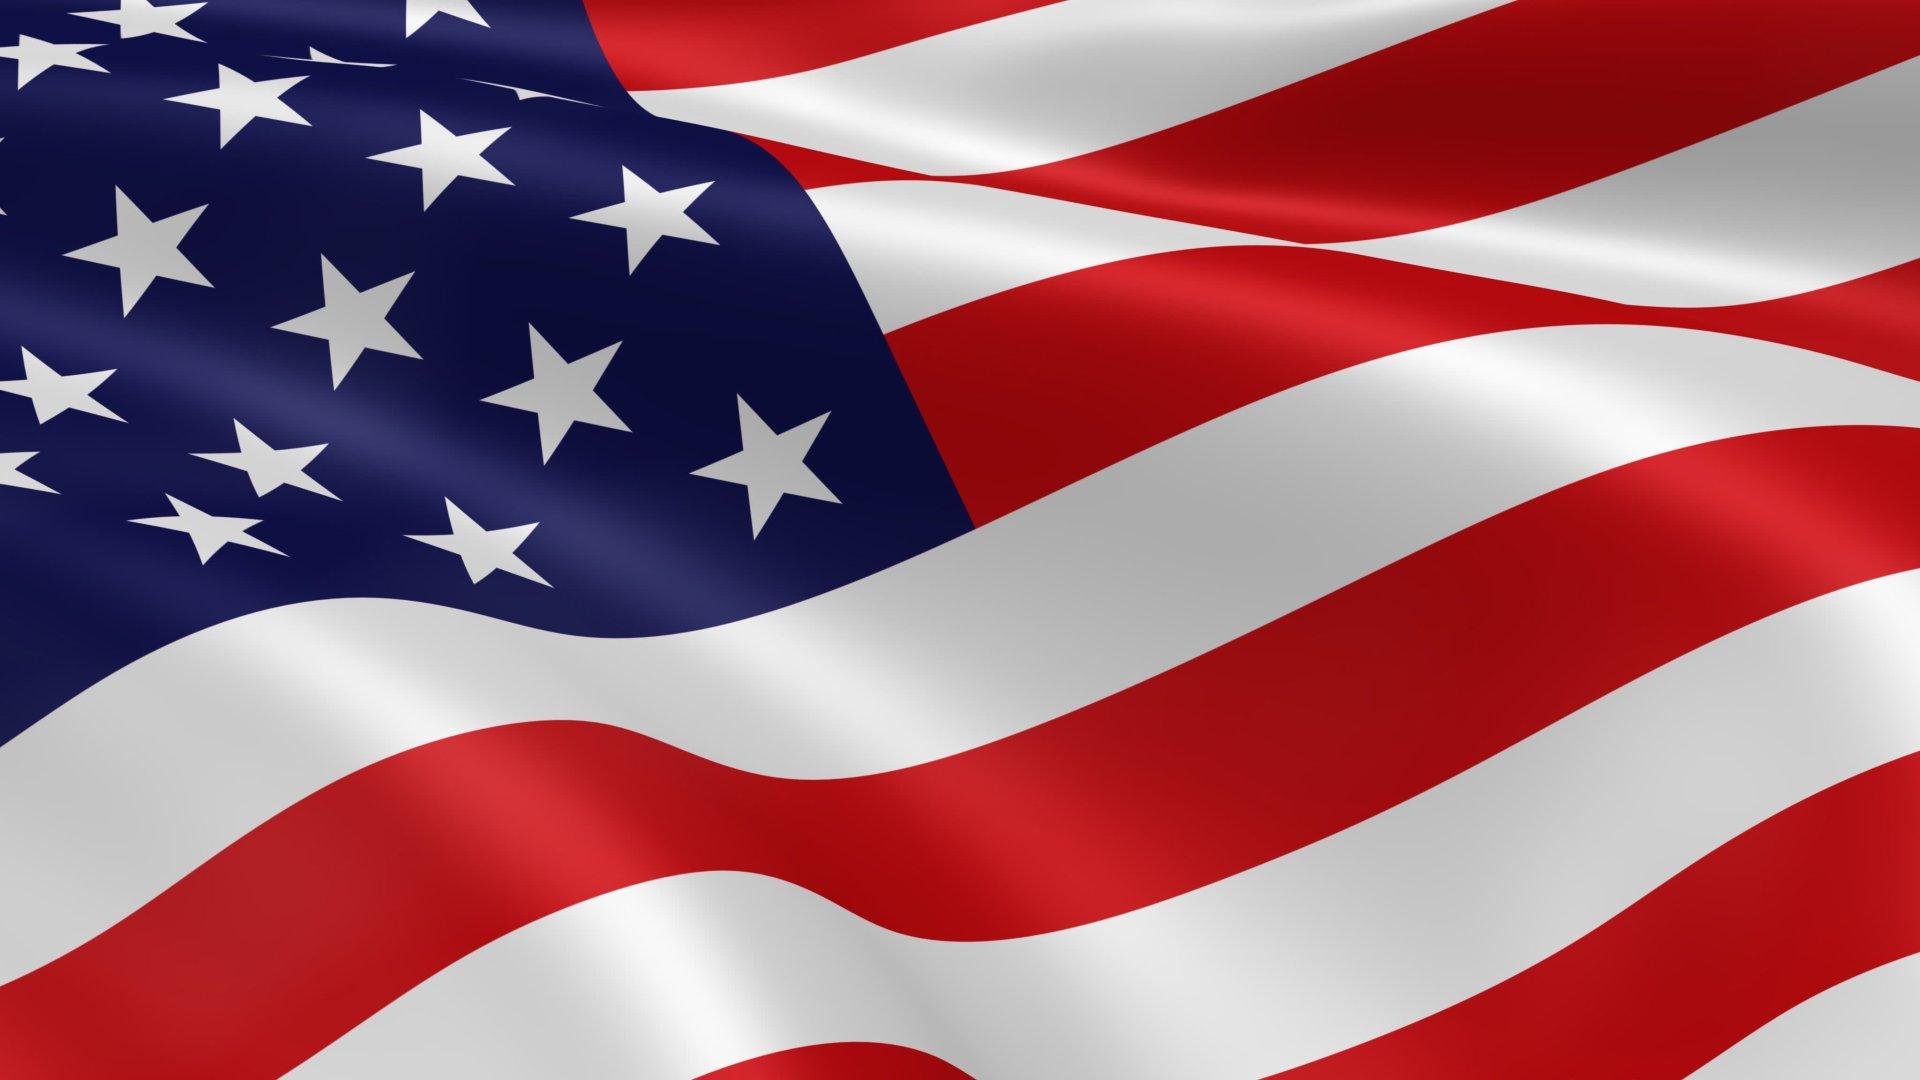 Bandera Estados Unidos Foment Del Treball